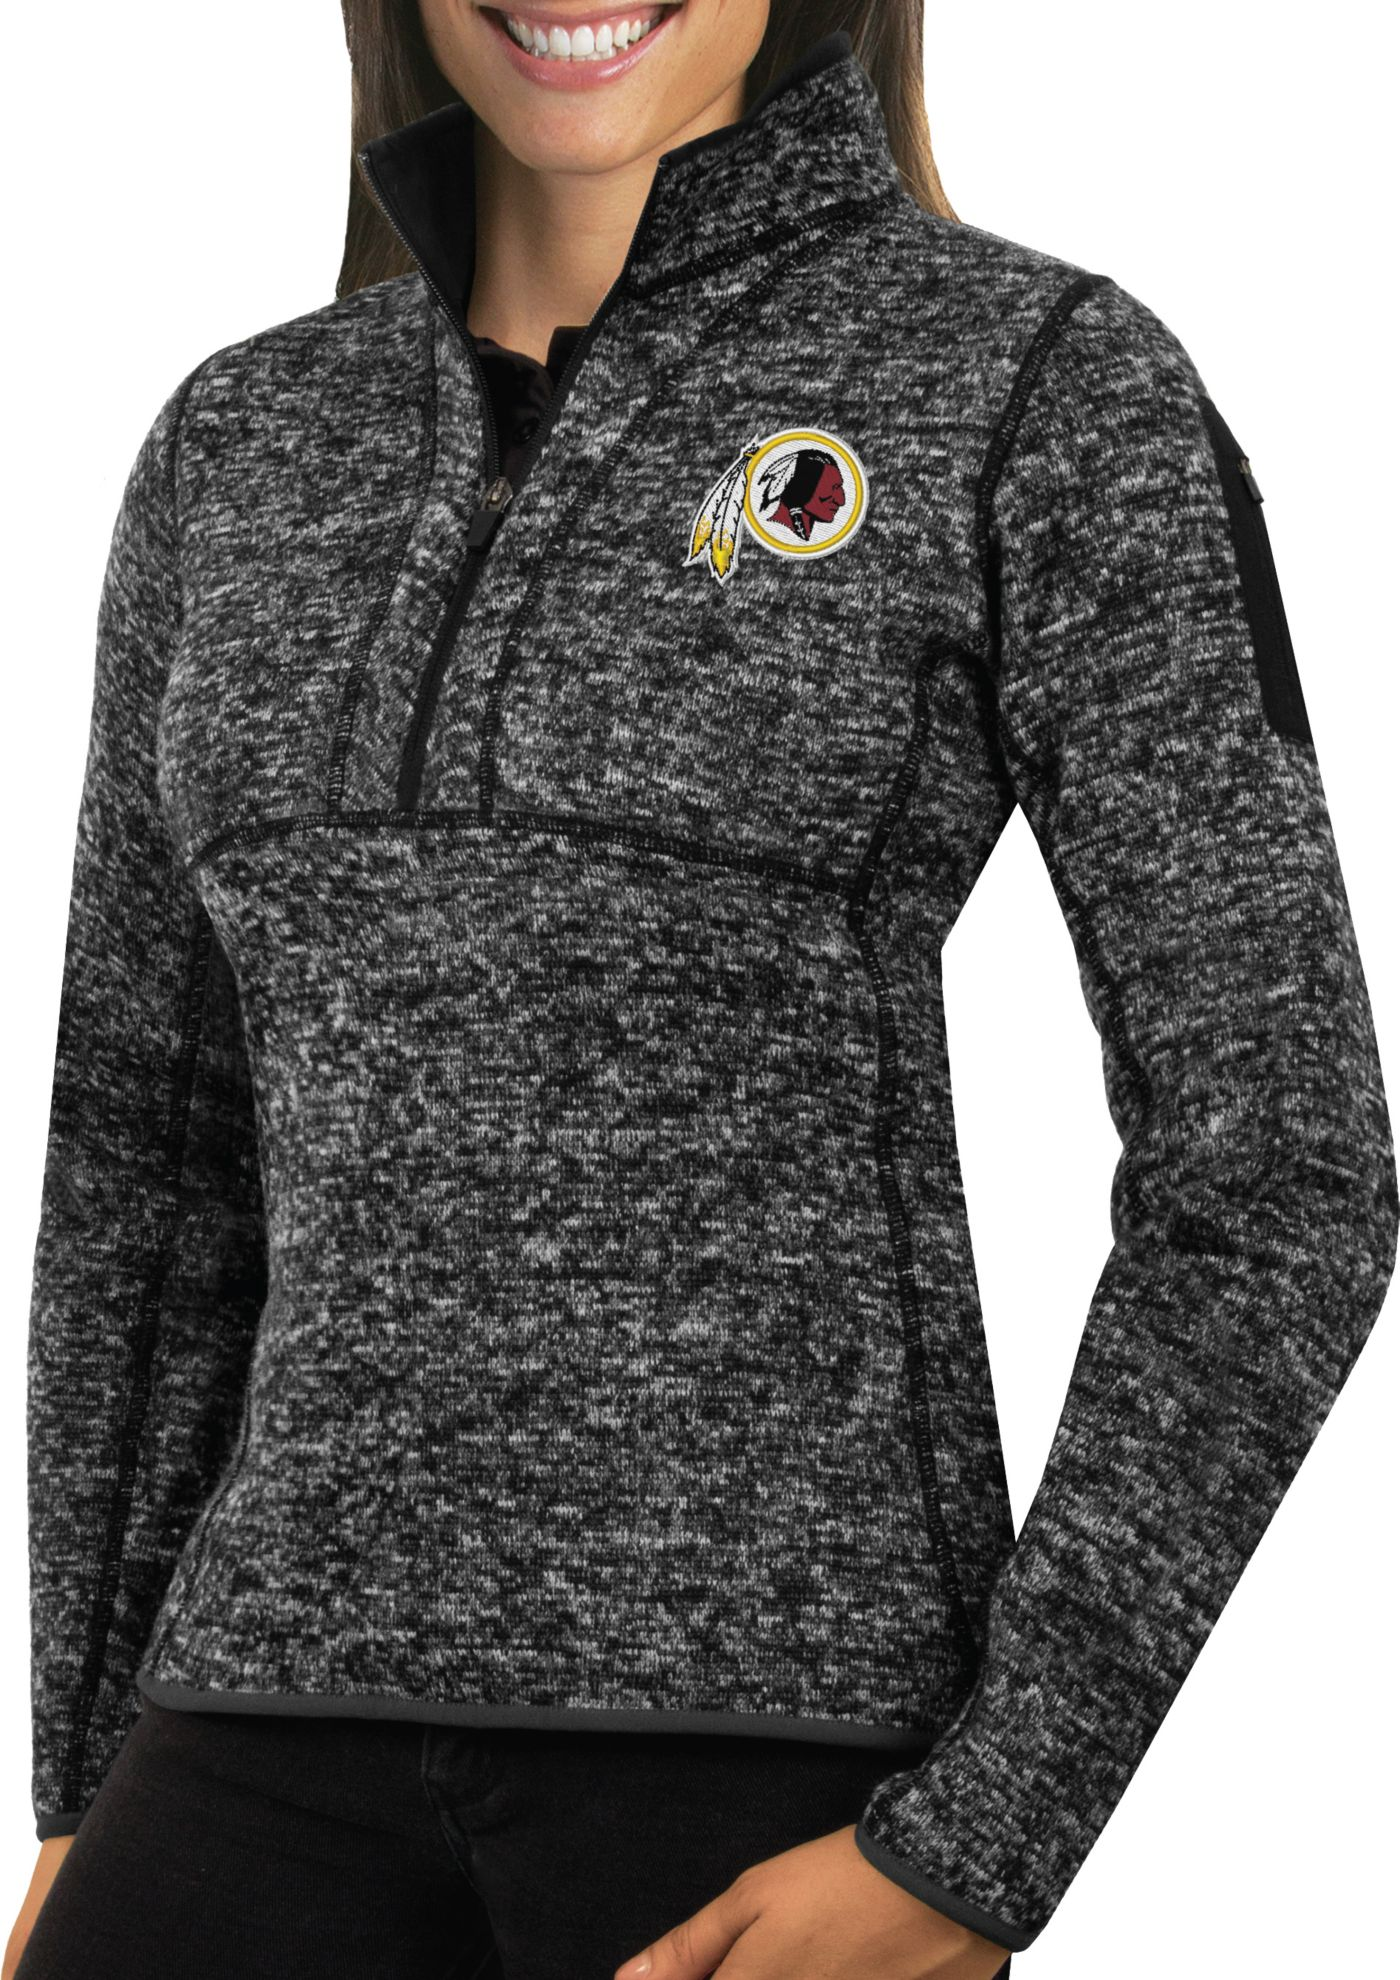 Antigua Women's Washington Redskins Fortune Black Pullover Jacket